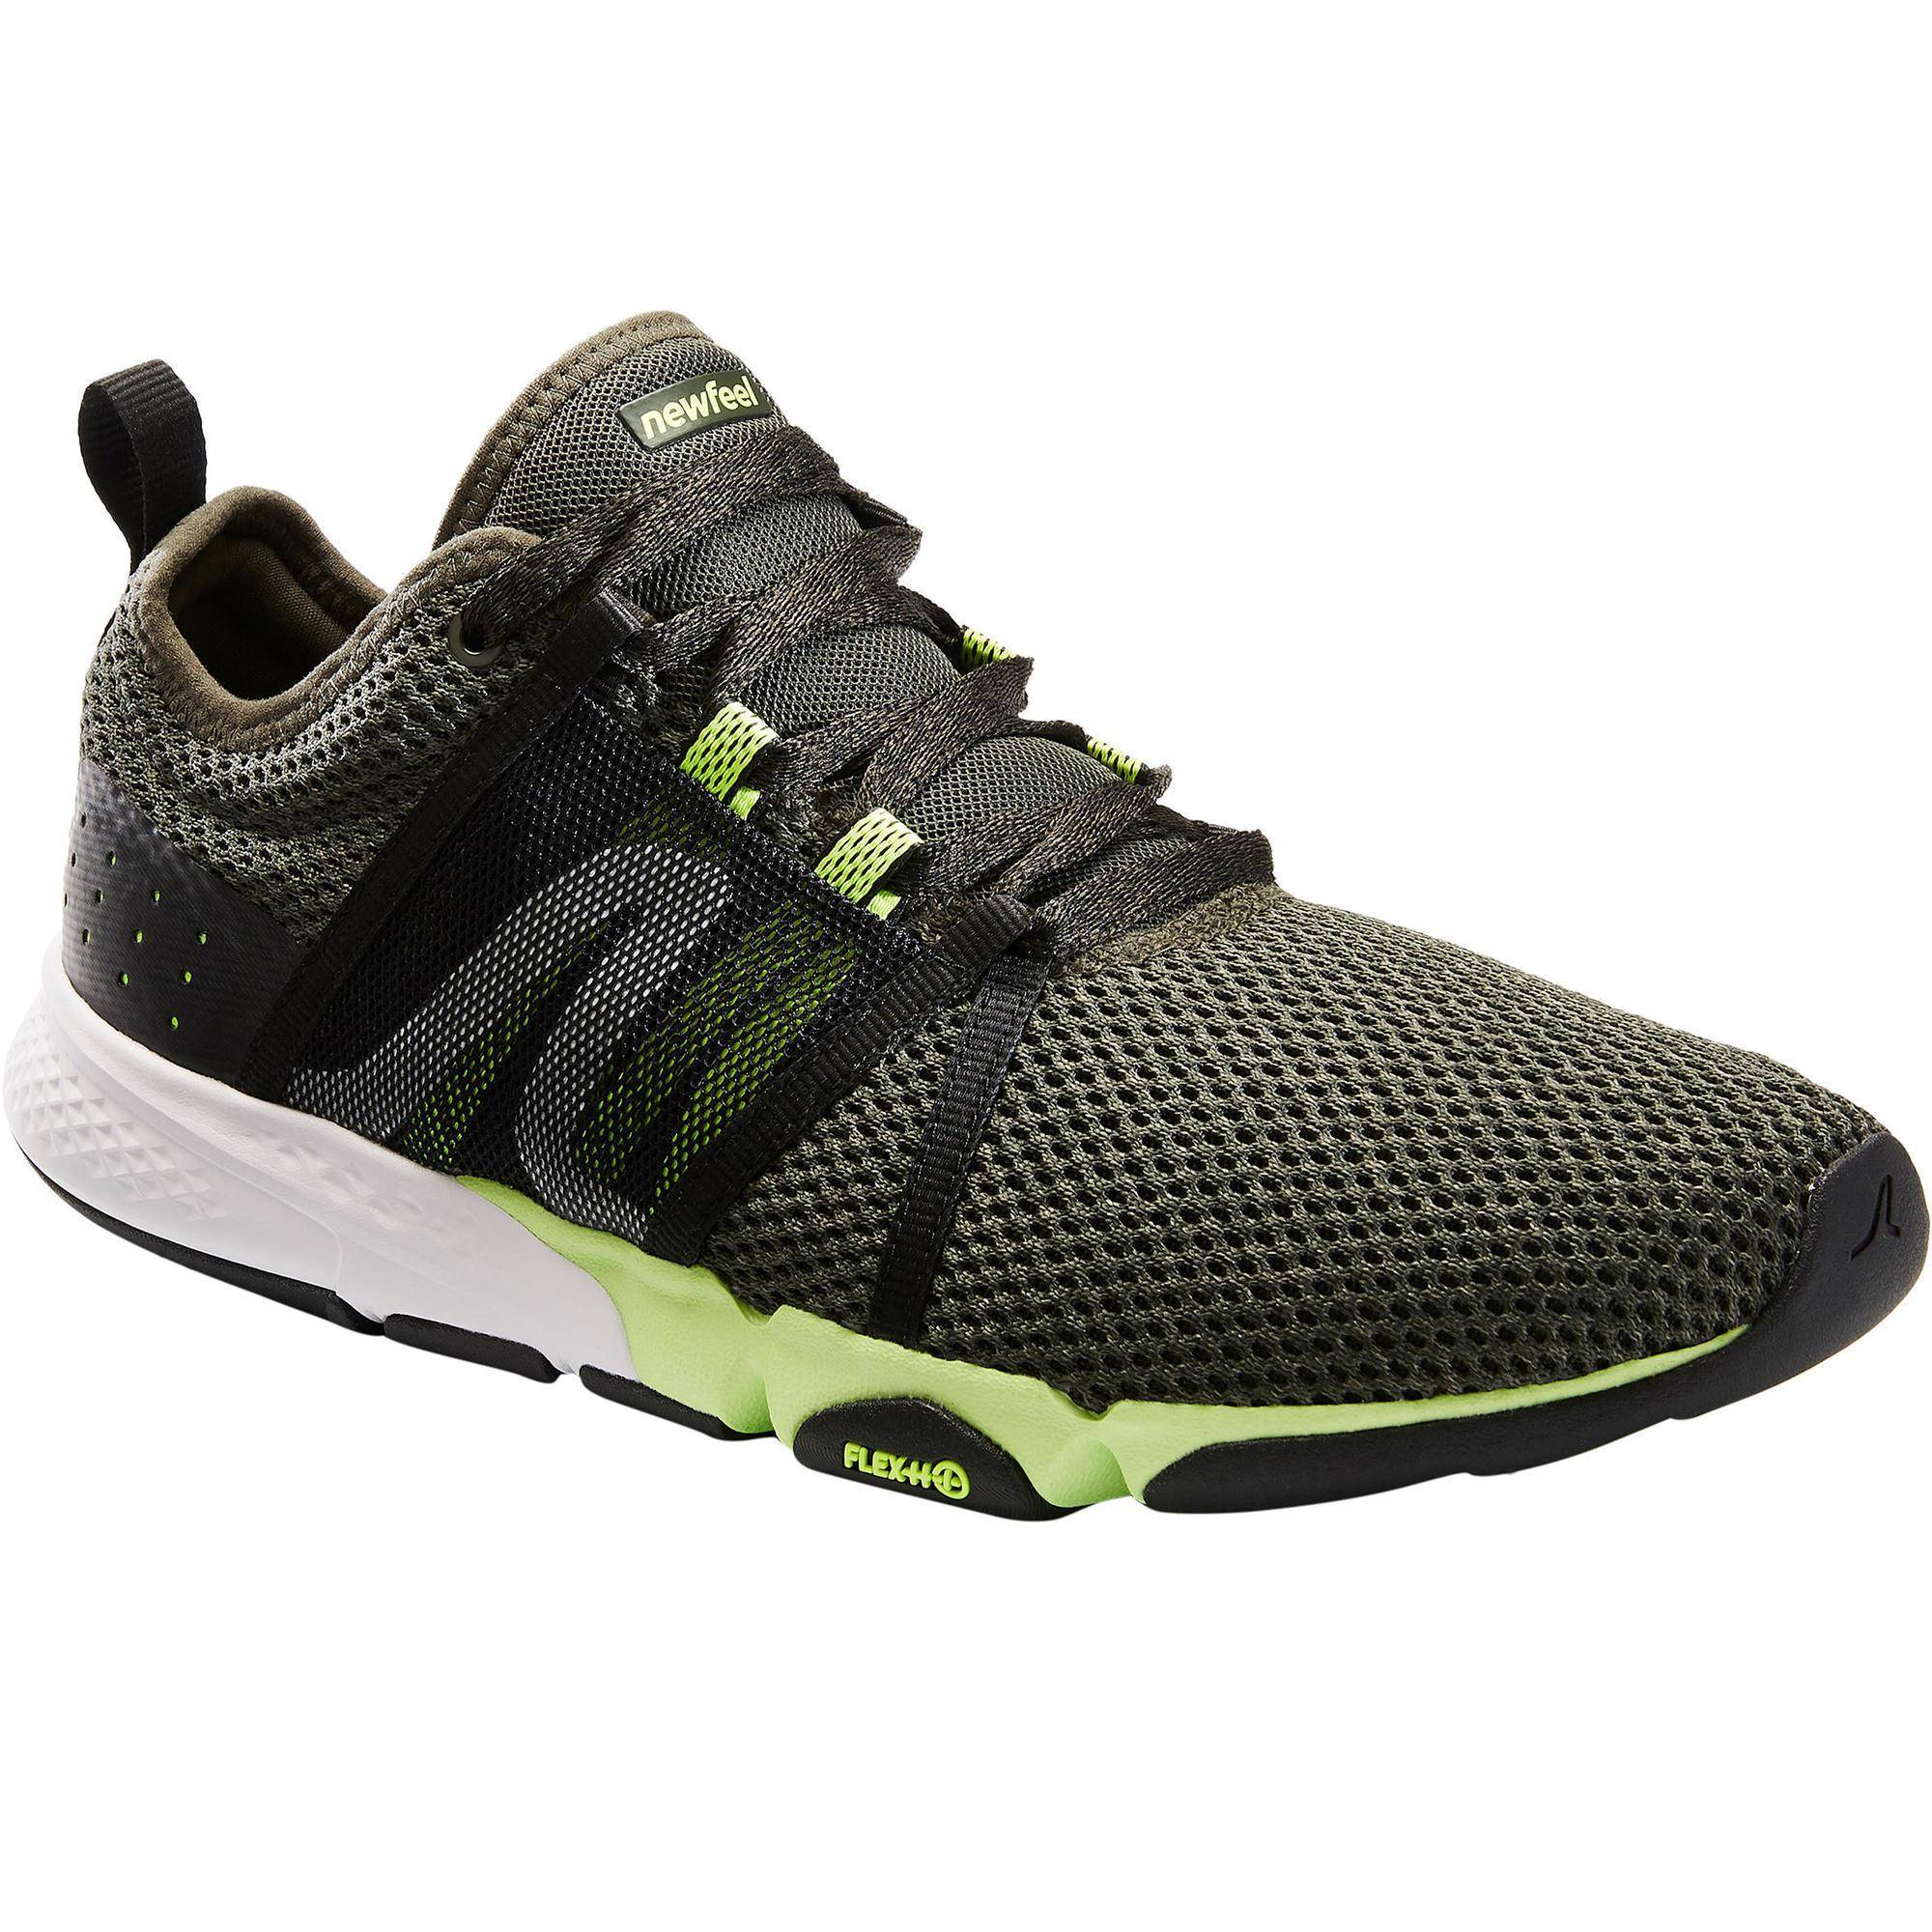 Newfeel Chaussures marche sportive homme PW 540 Flex-H+ kaki / vert - Newfeel